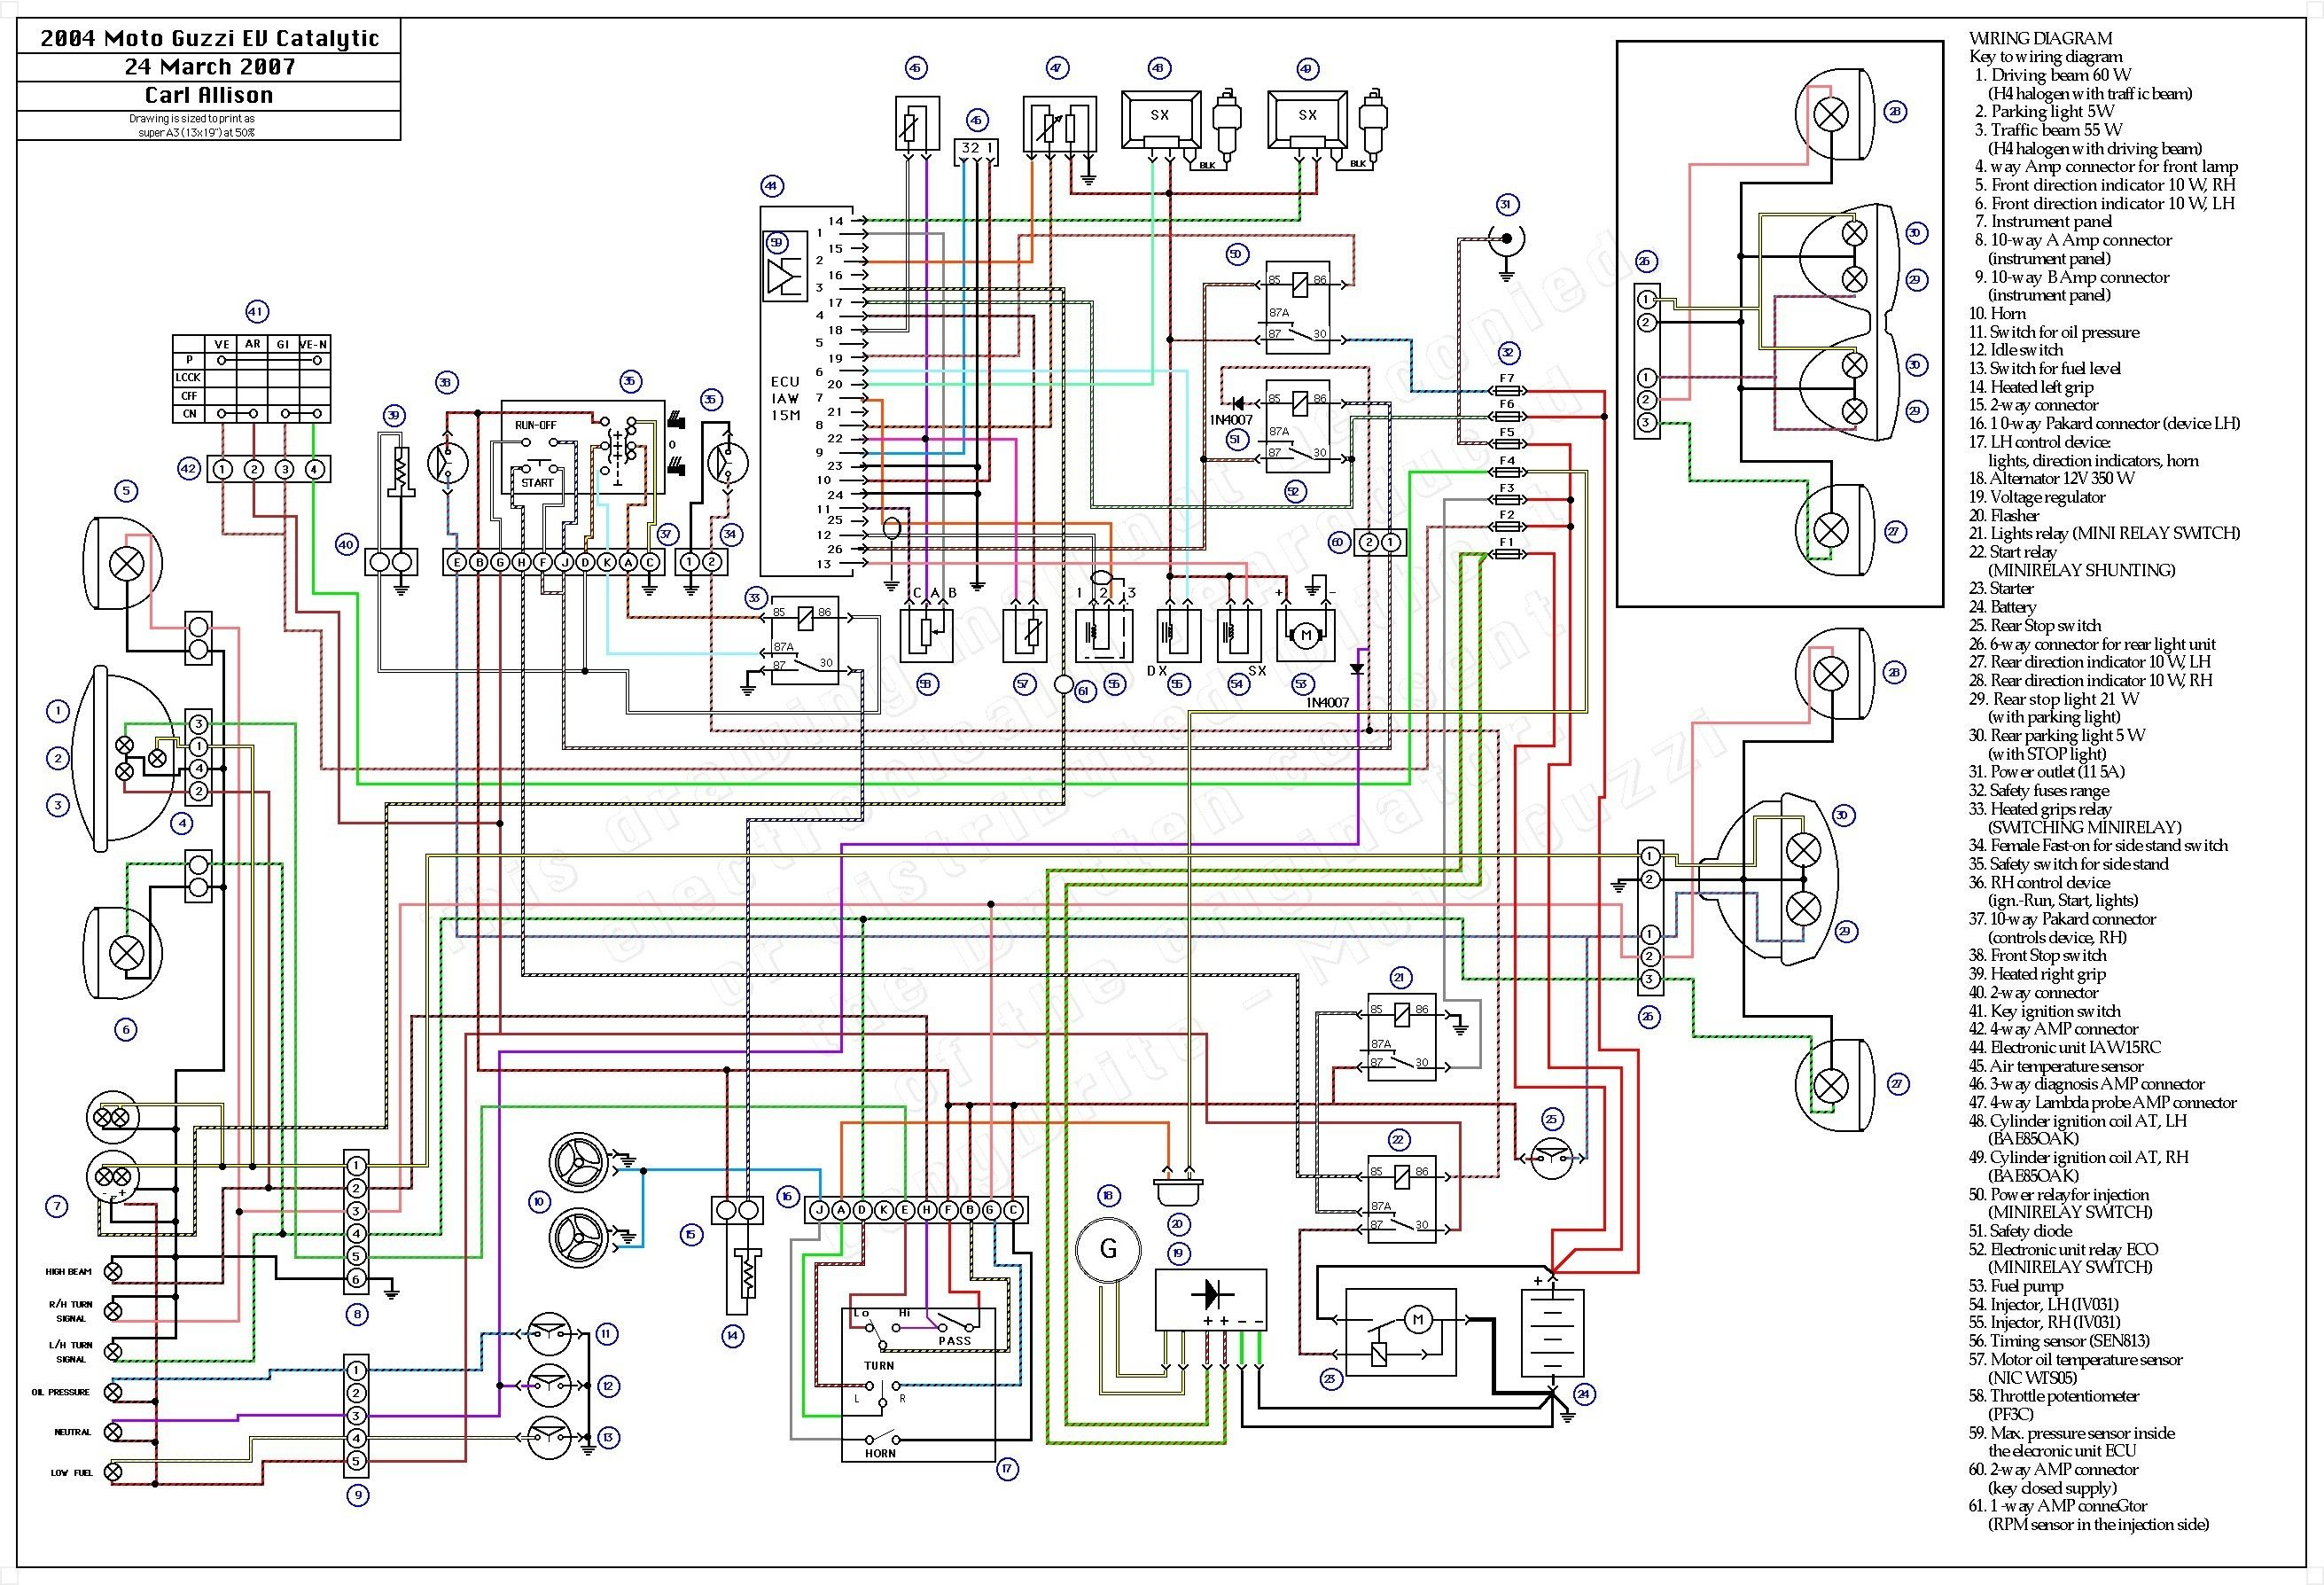 wiring diagram cb360 wiring diagram whelen light bar wiring diagram with cb360 wiring diagram [ 2622 x 1788 Pixel ]